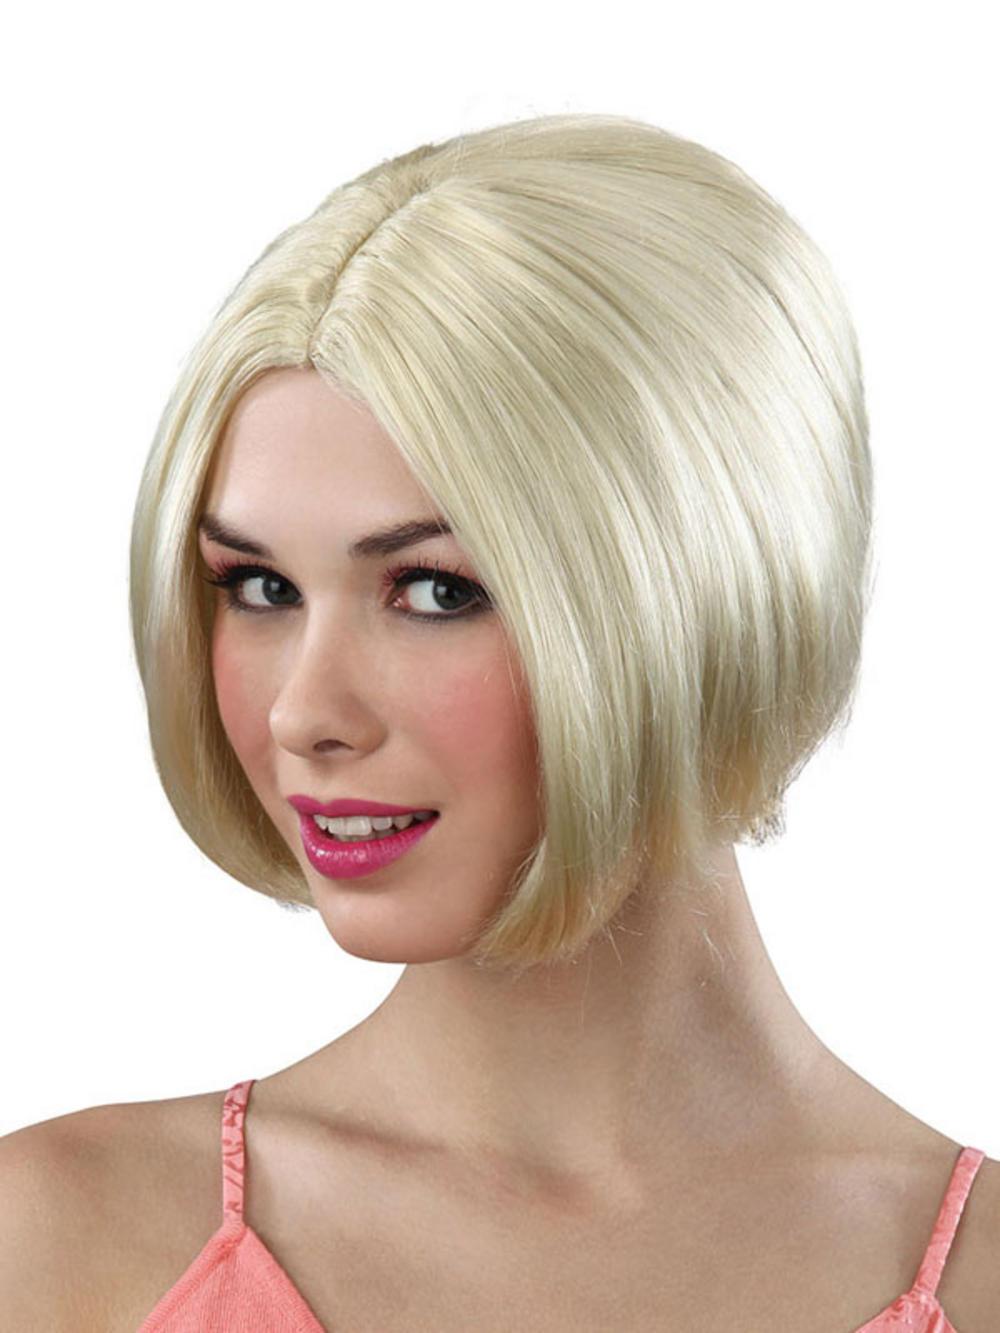 Posh Spice Blonde 22